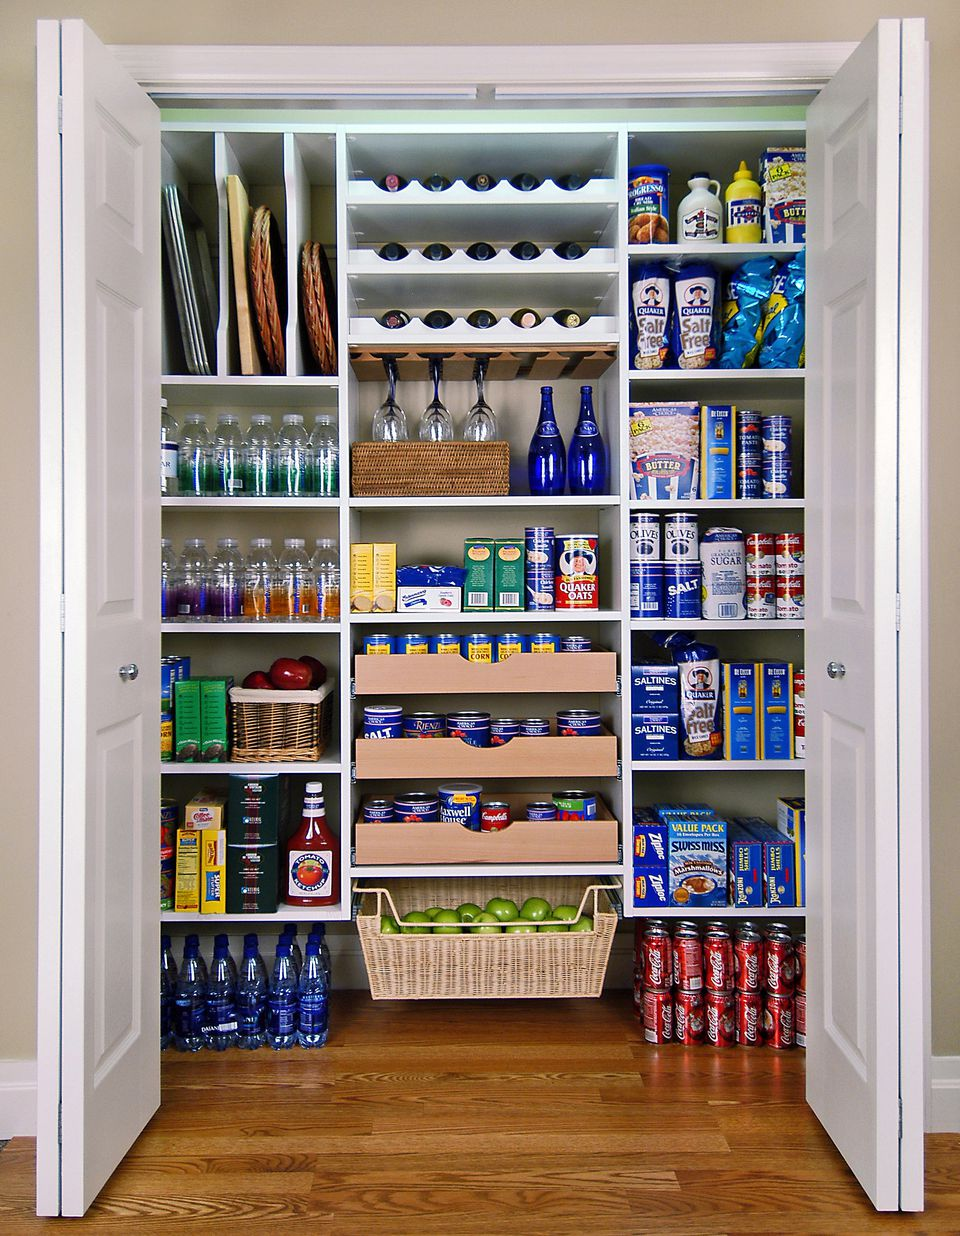 Superbe Storage : Kitchen Pantry Storage Ideas Custom Closet Storageu201a Closet  Storage Designu201a Wood Storage Closet And Storages